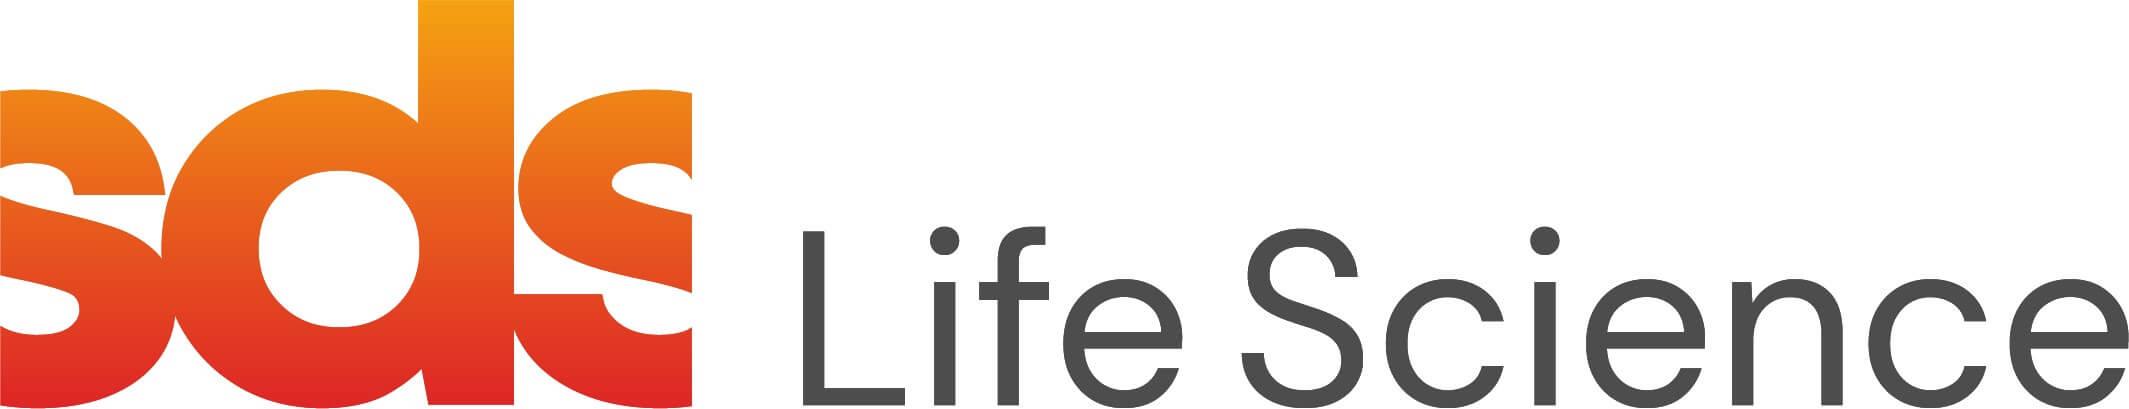 SDS Life Science Logo